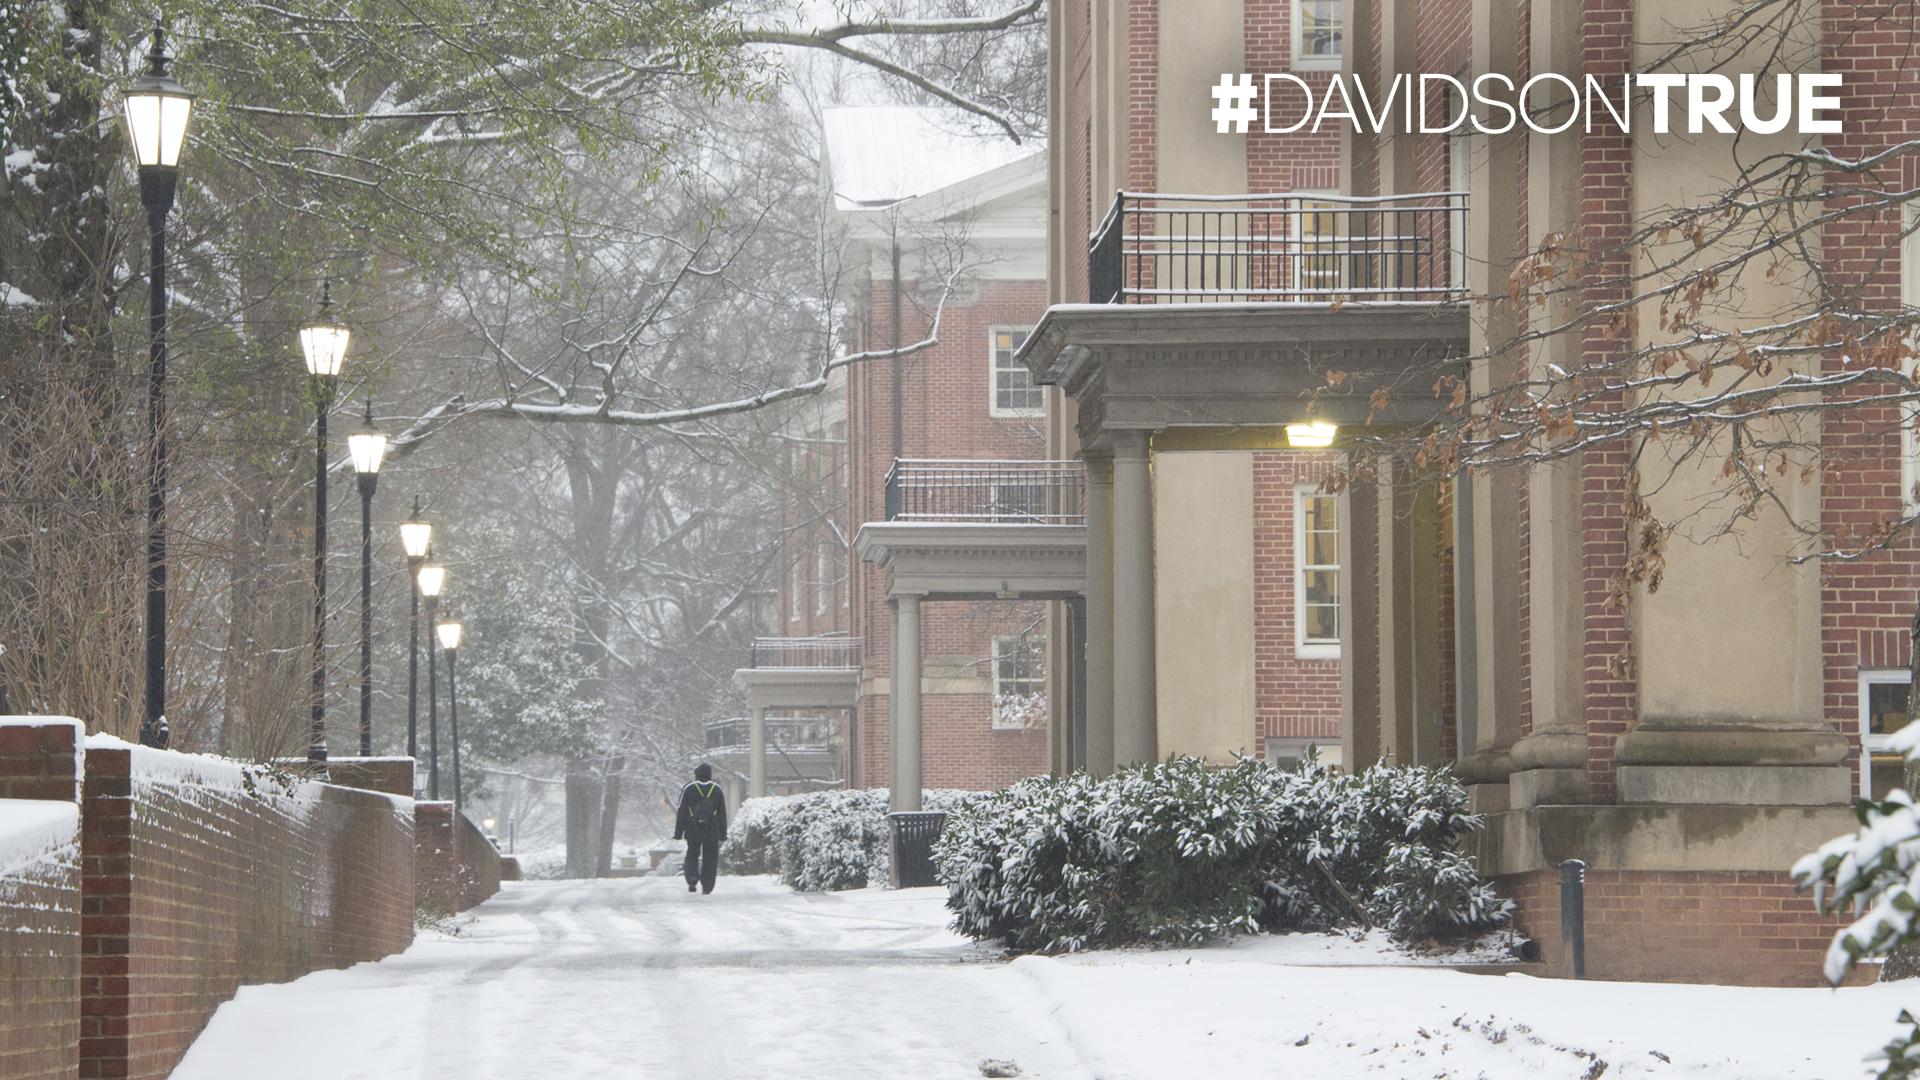 Students along snowy dorm row with Davidson True wordmark